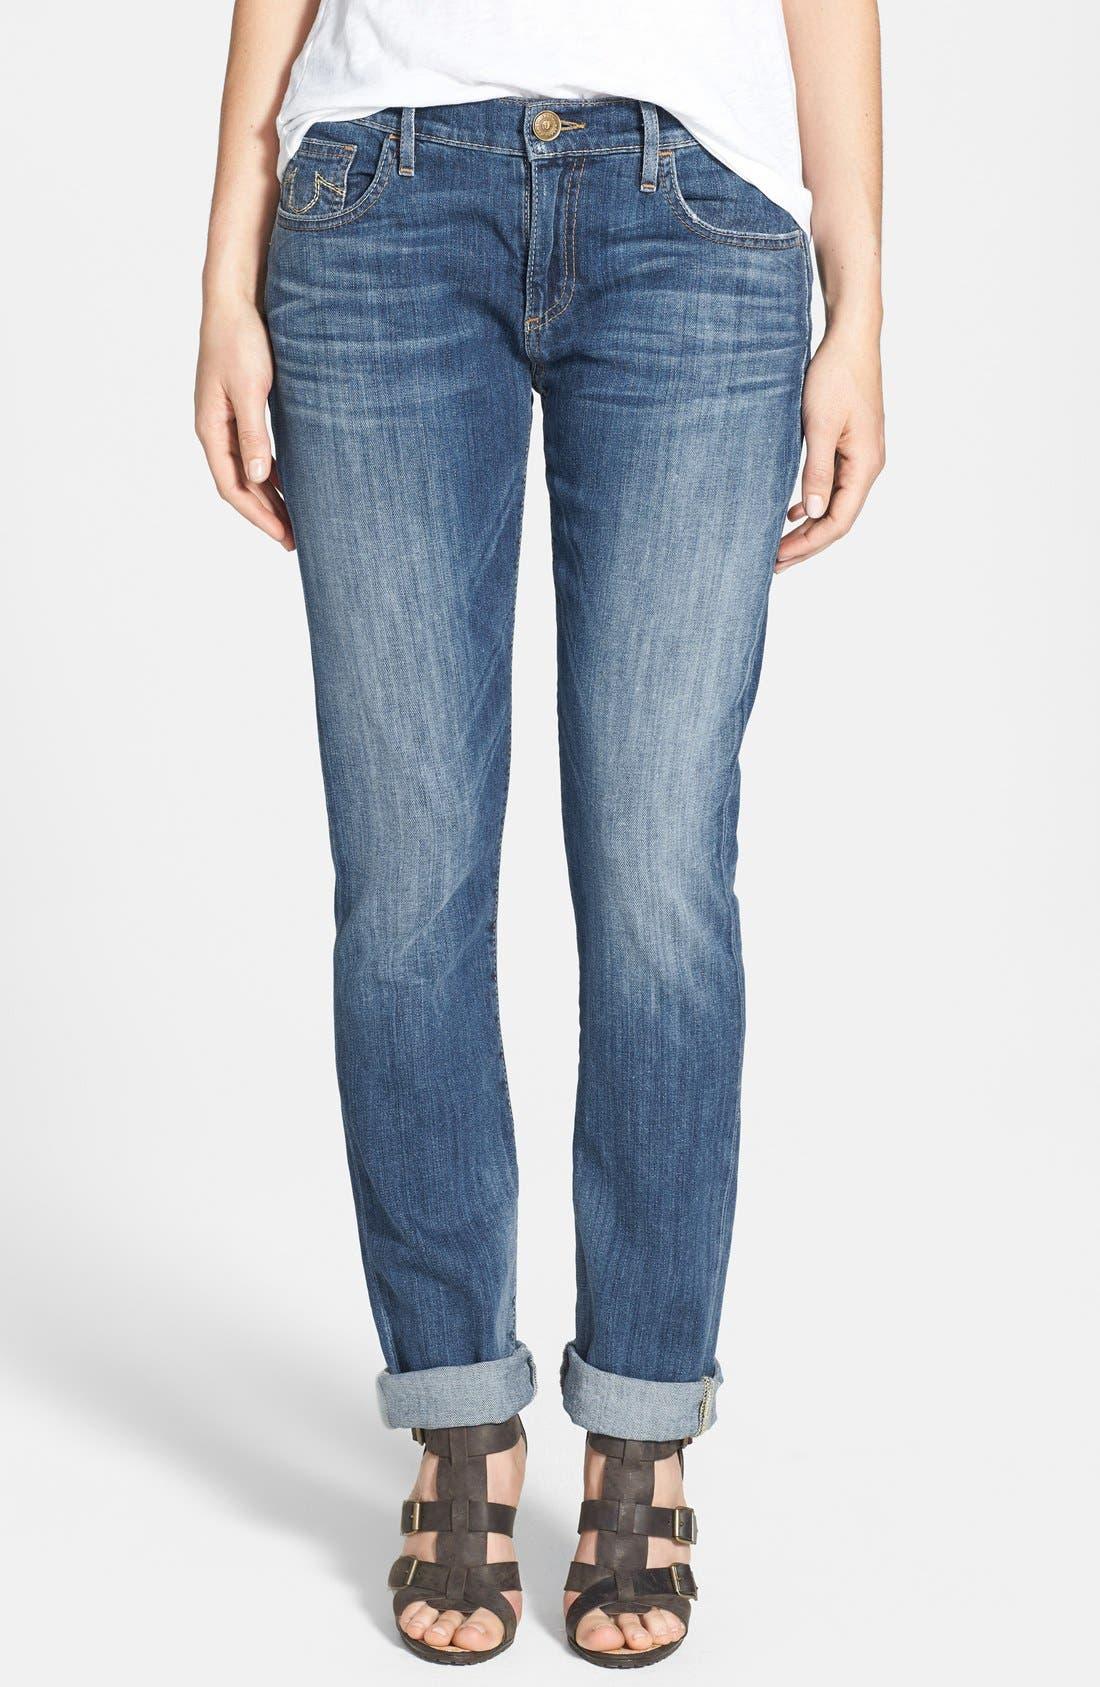 Alternate Image 1 Selected - True Religion Brand Jeans 'Audrey' Boyfriend Jeans (Spring Ink)